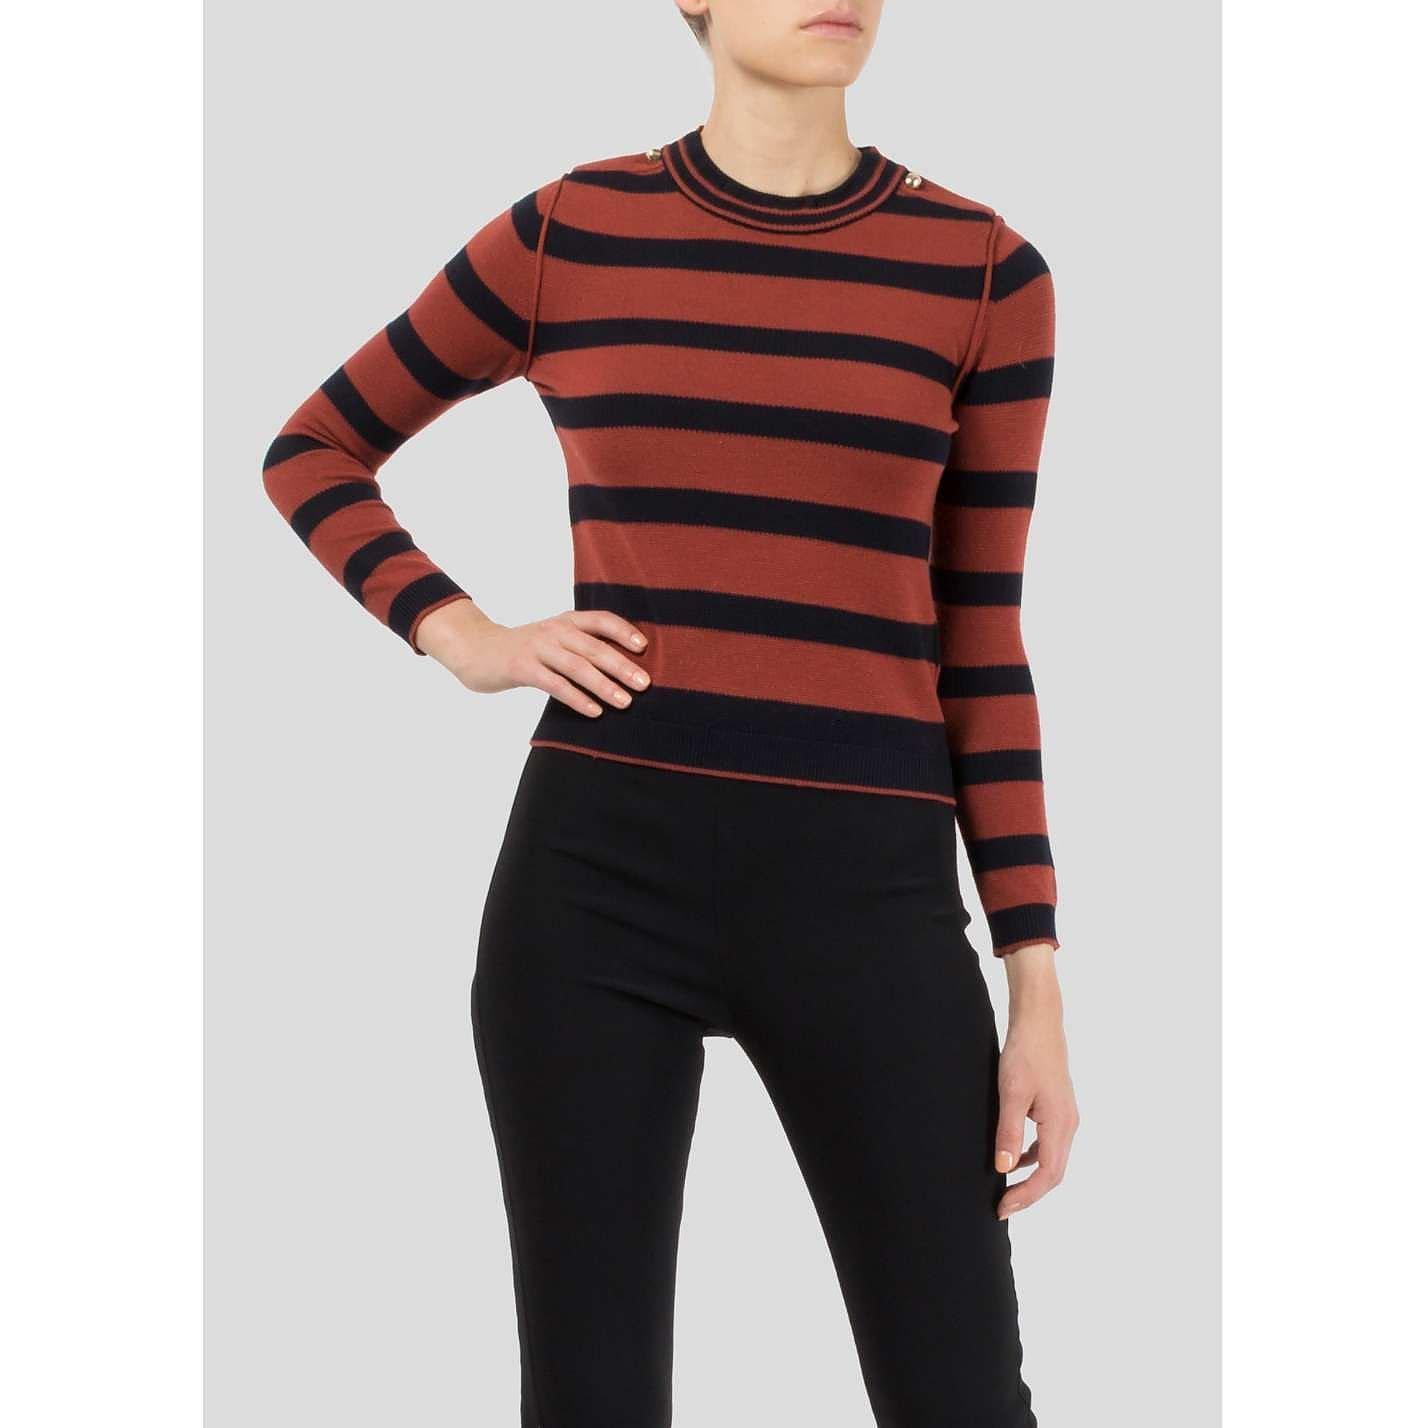 Chloé Striped Wool Sweater